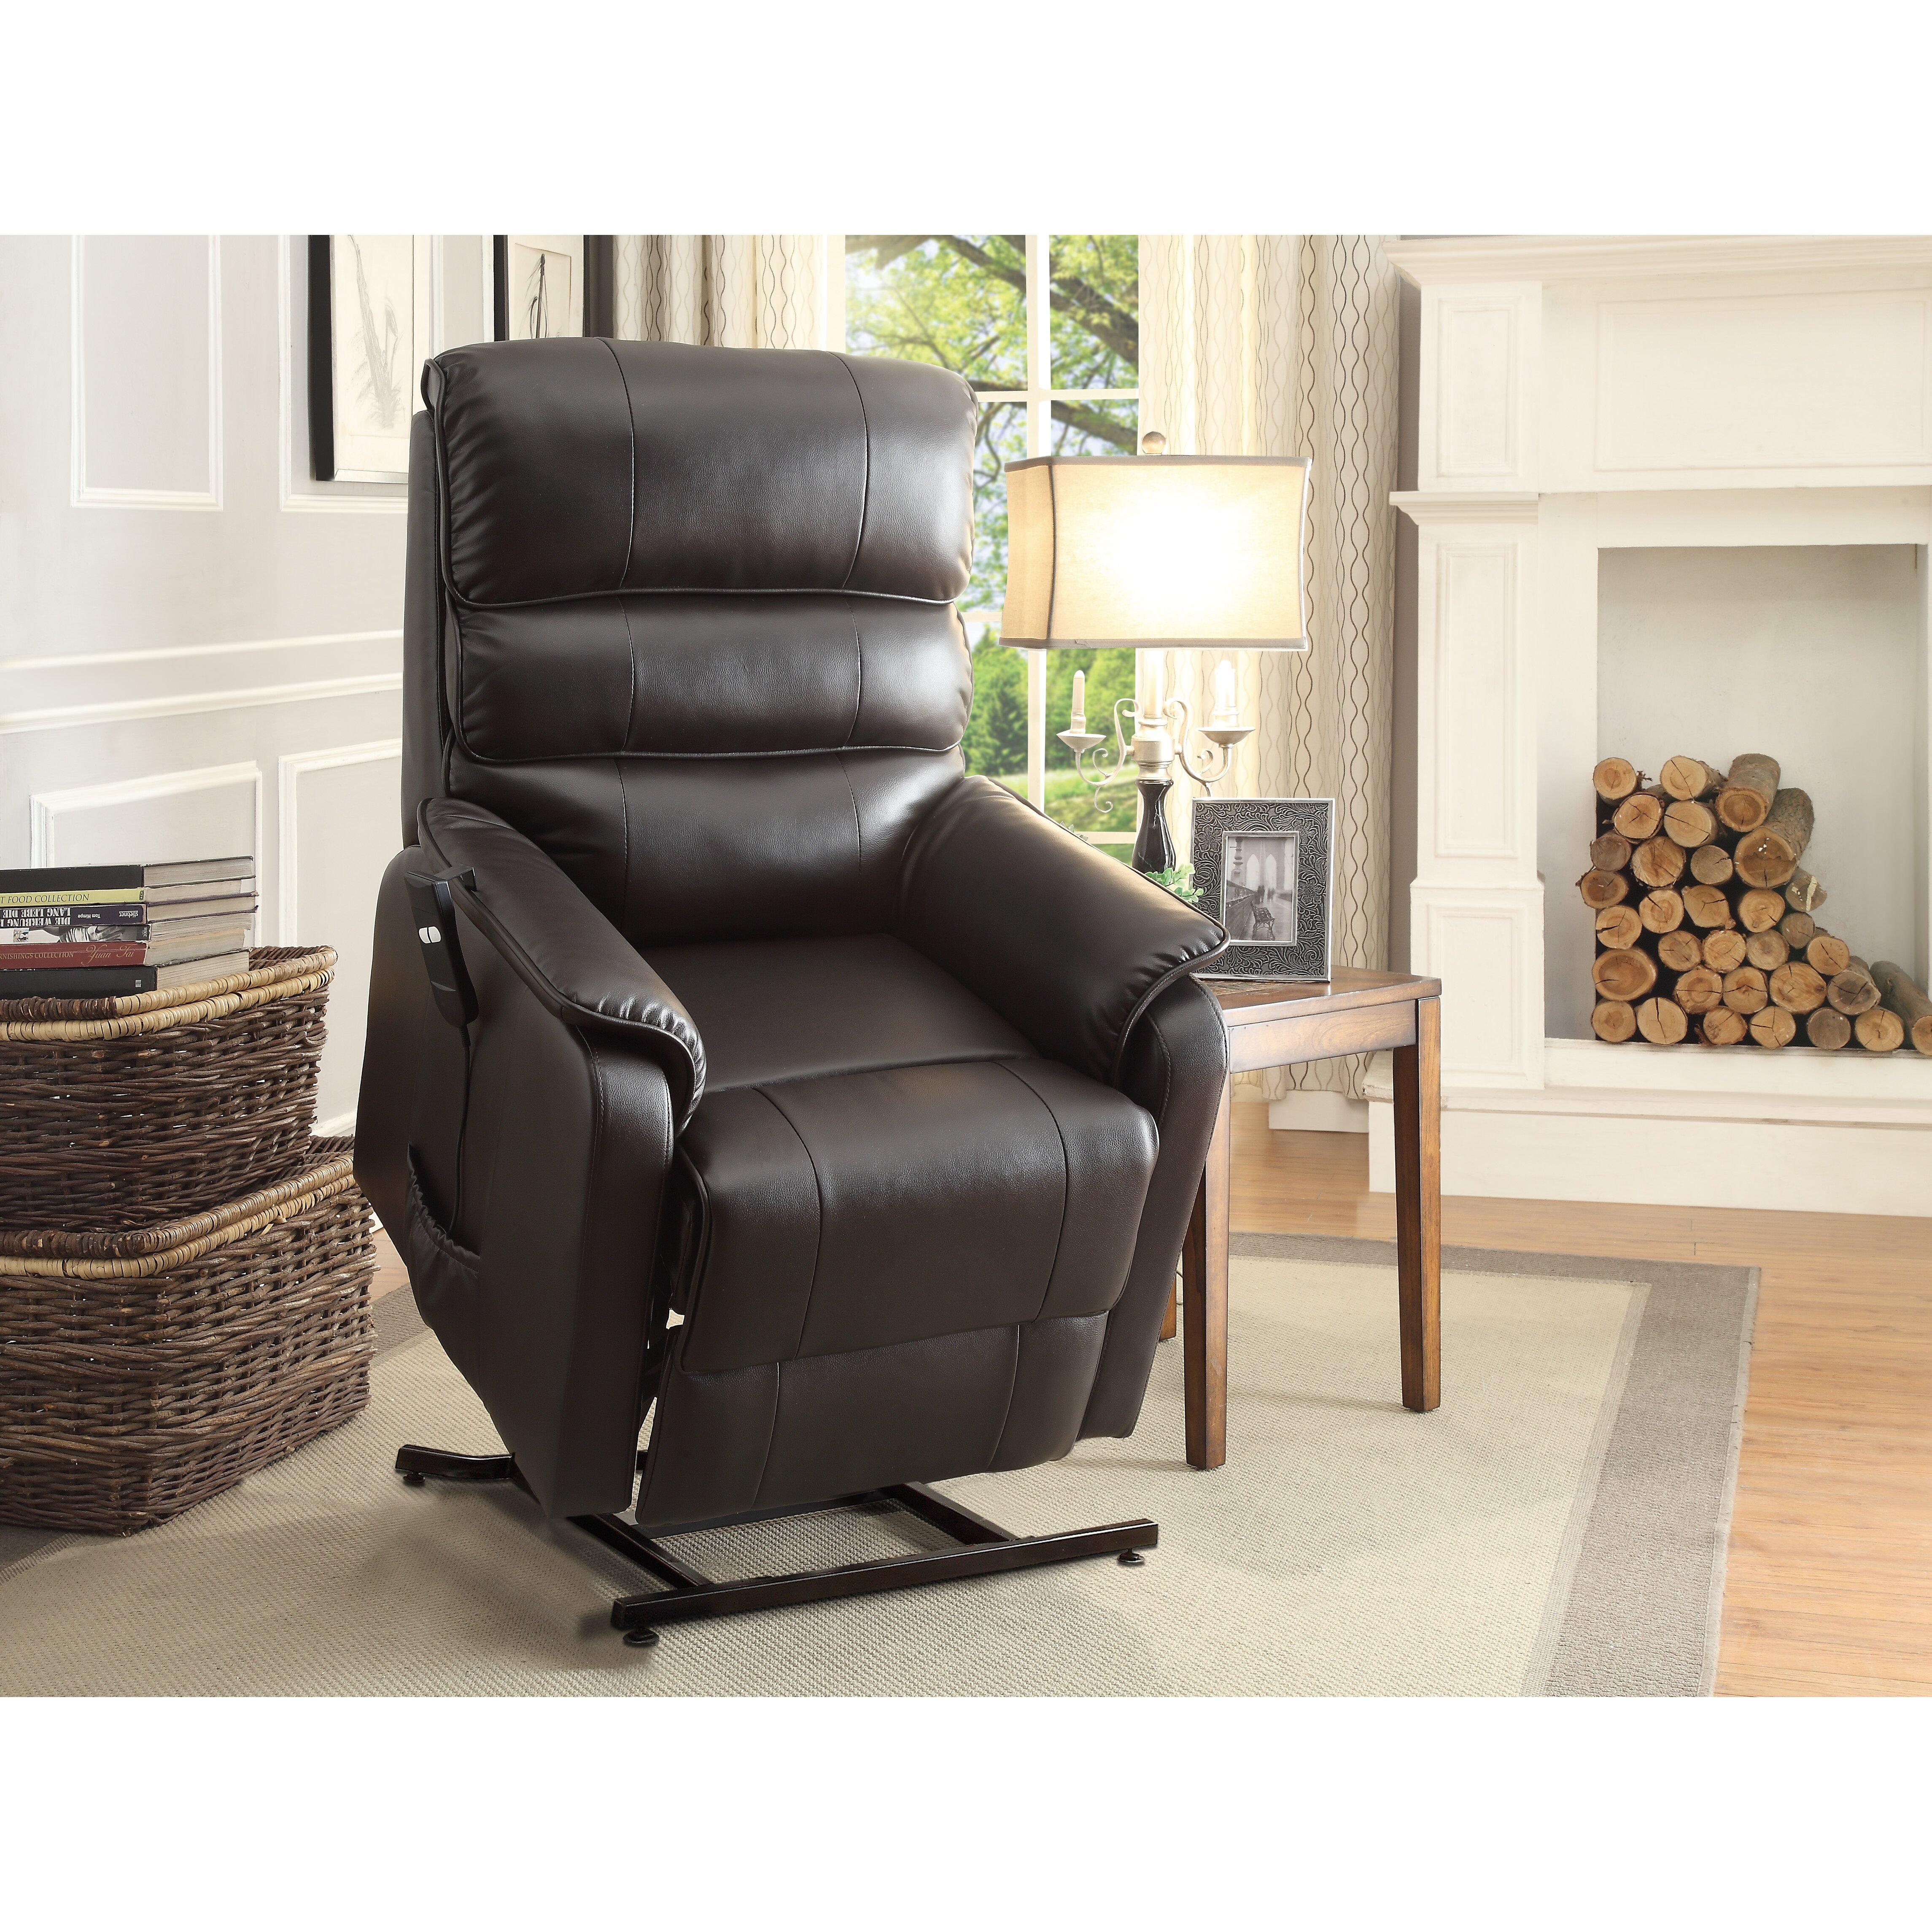 Woodhaven Living Room Furniture Woodhaven Hill Kellen Power Lift Recliner Reviews Wayfair